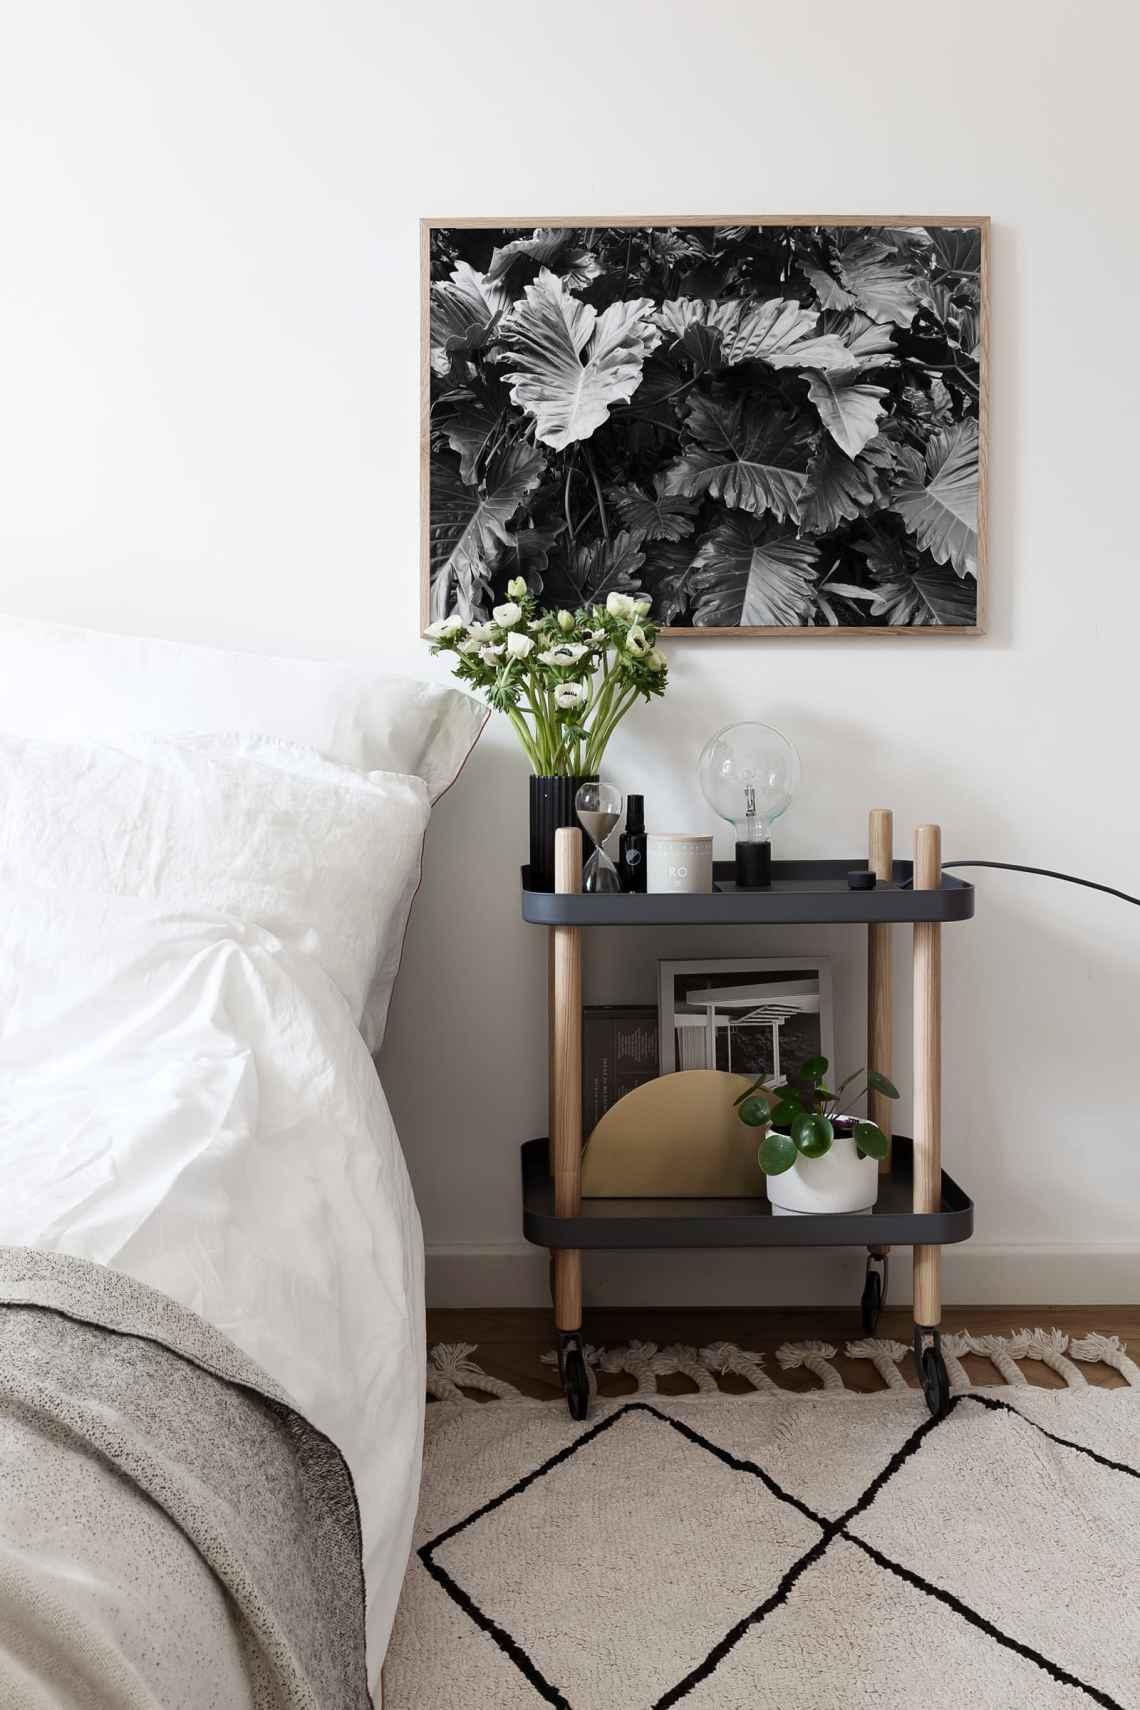 Bedside table - via Coco Lapine Design blog